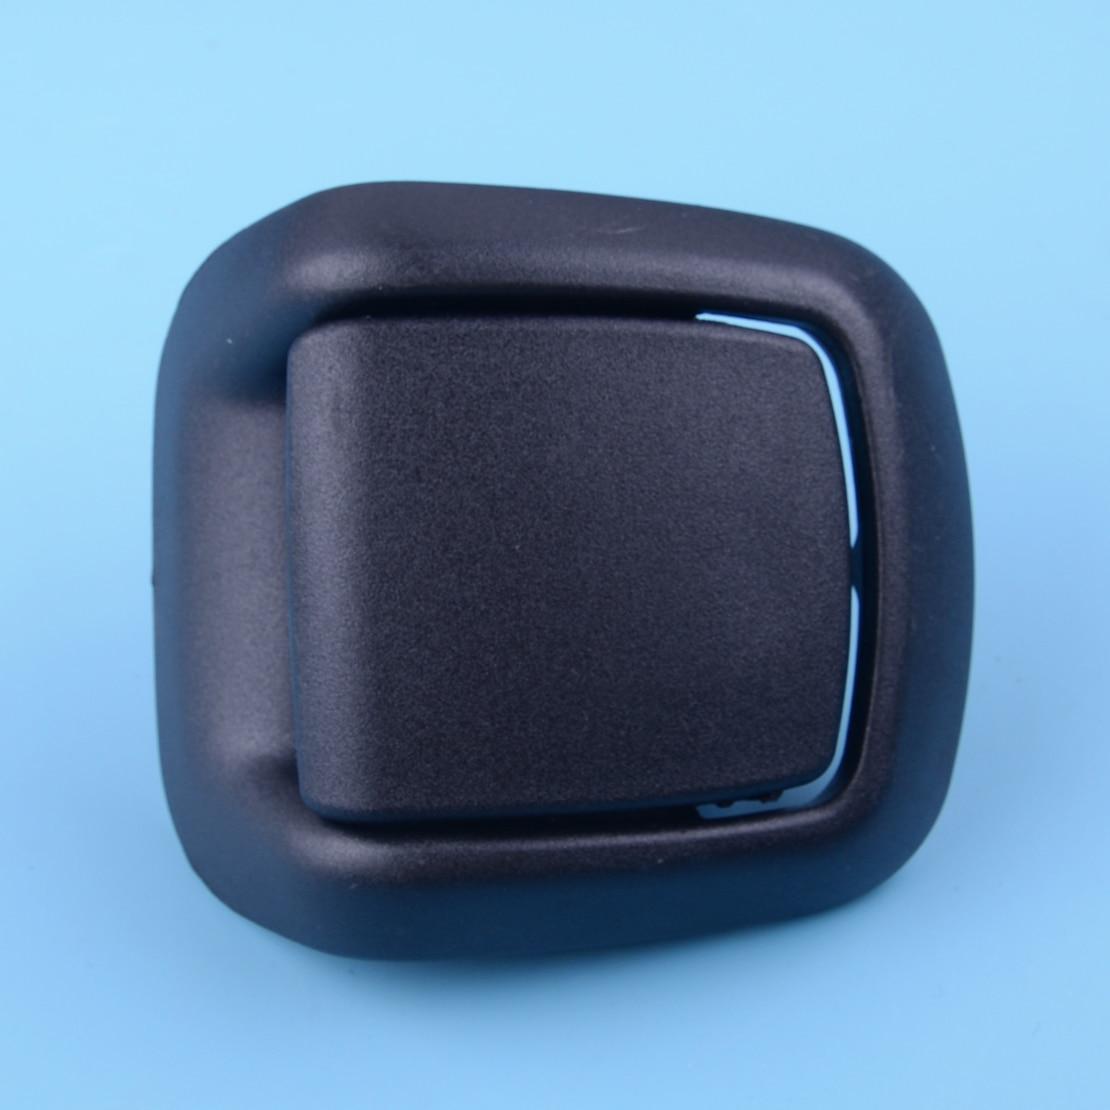 Plastic Black Car Side Front Right Seat Tilt Handle 1417520 Fit For Ford Fiesta MK6 VI 3 Door 2002 2003 2004 2005 2006 2007 2008